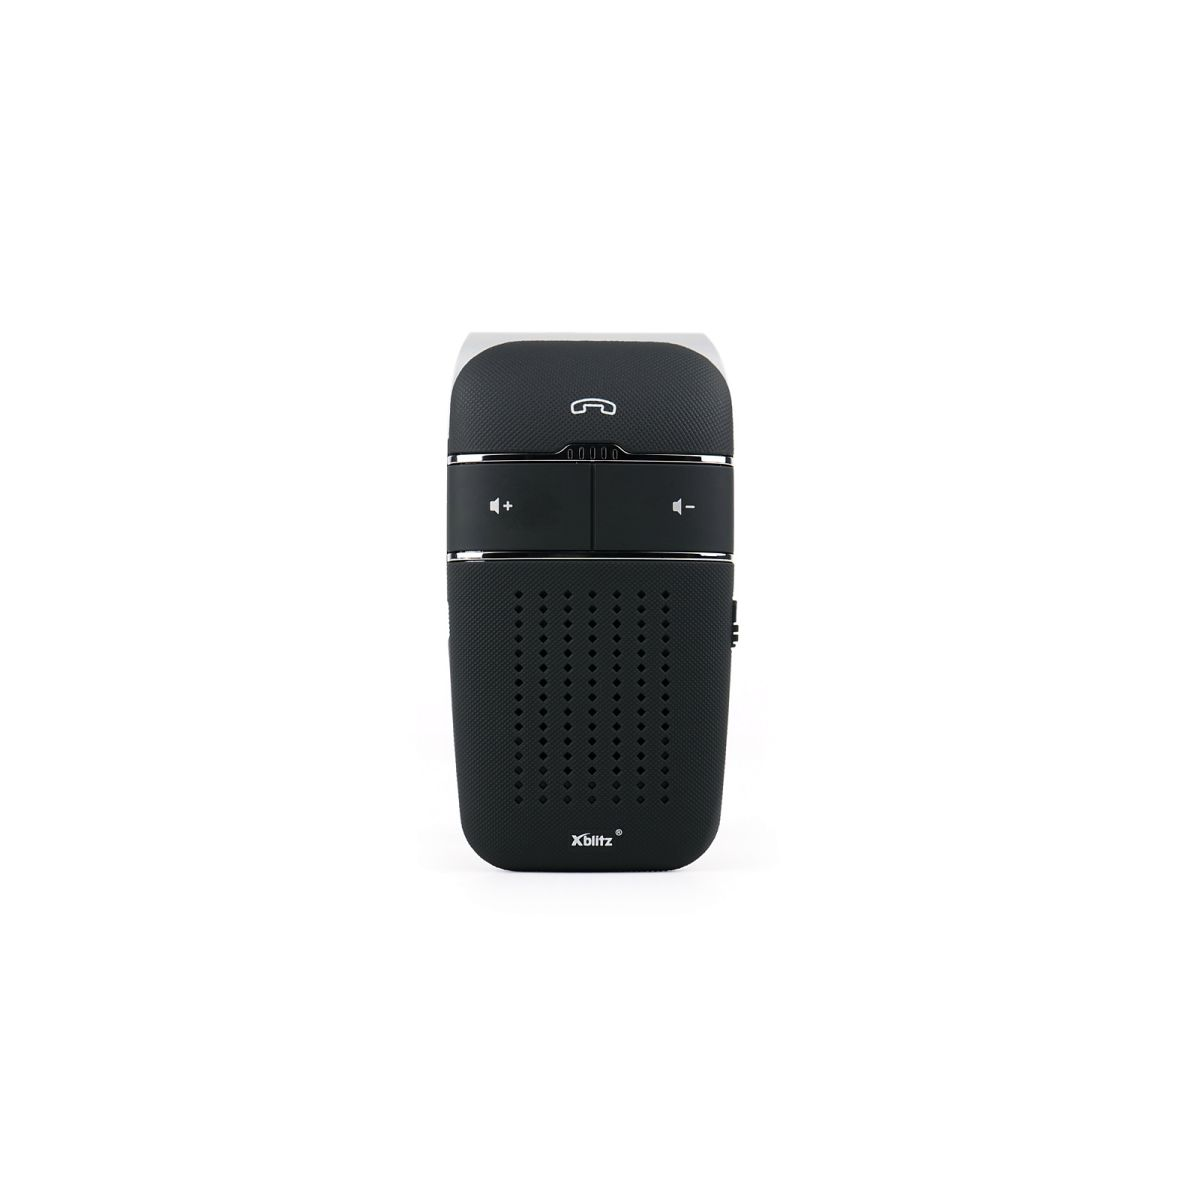 Xblitz X600 Professional - Bluetooth Handsfree do auta, hlasové ovládání, multipoint, dosah 10 m